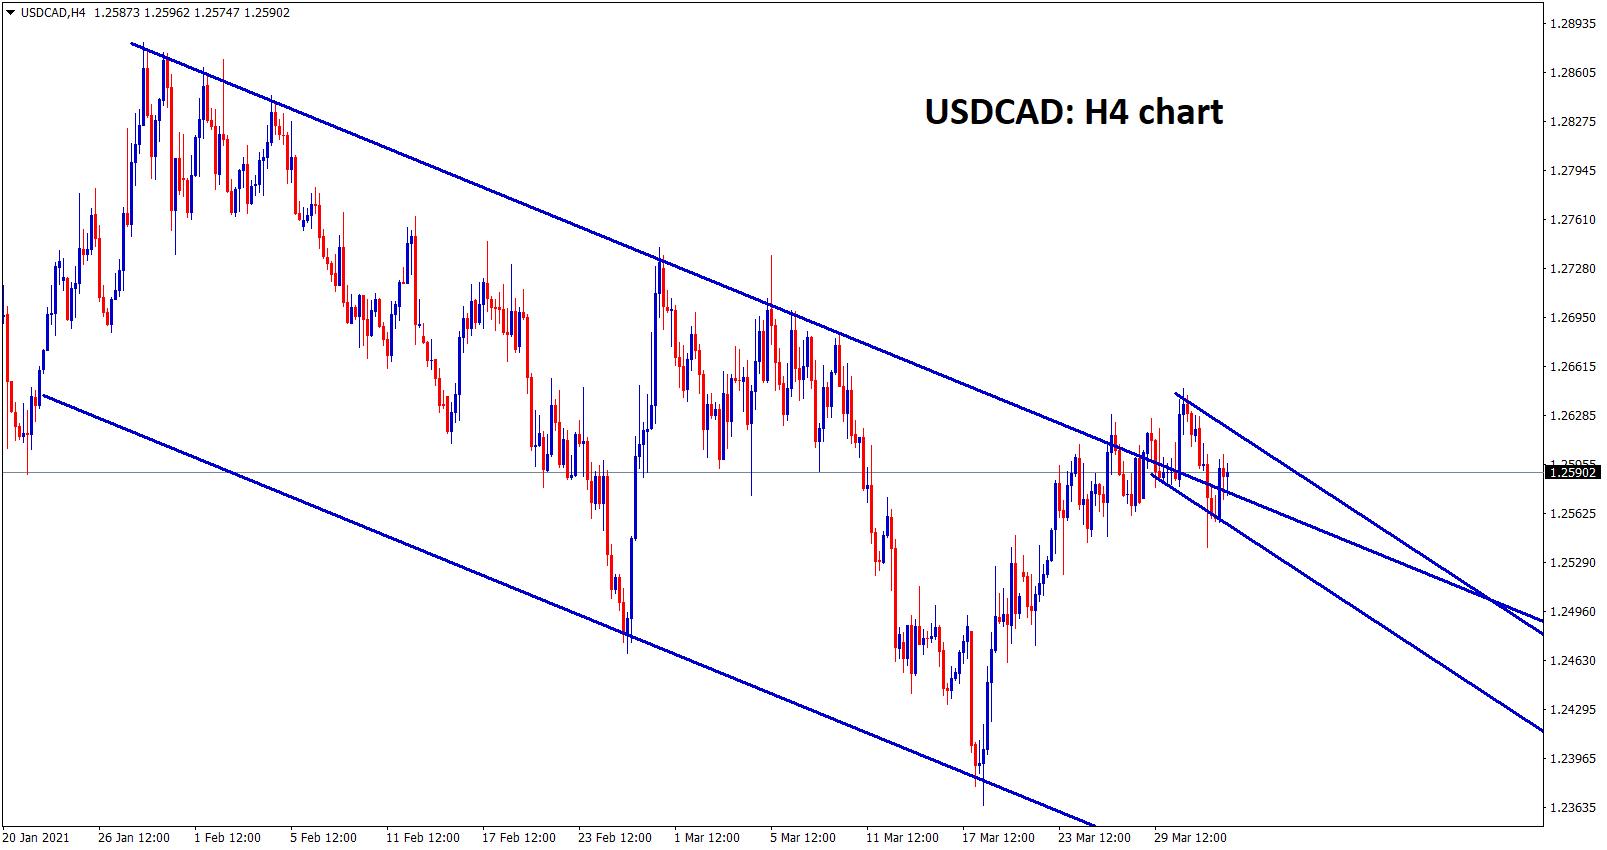 USDCAD descending channel buildup